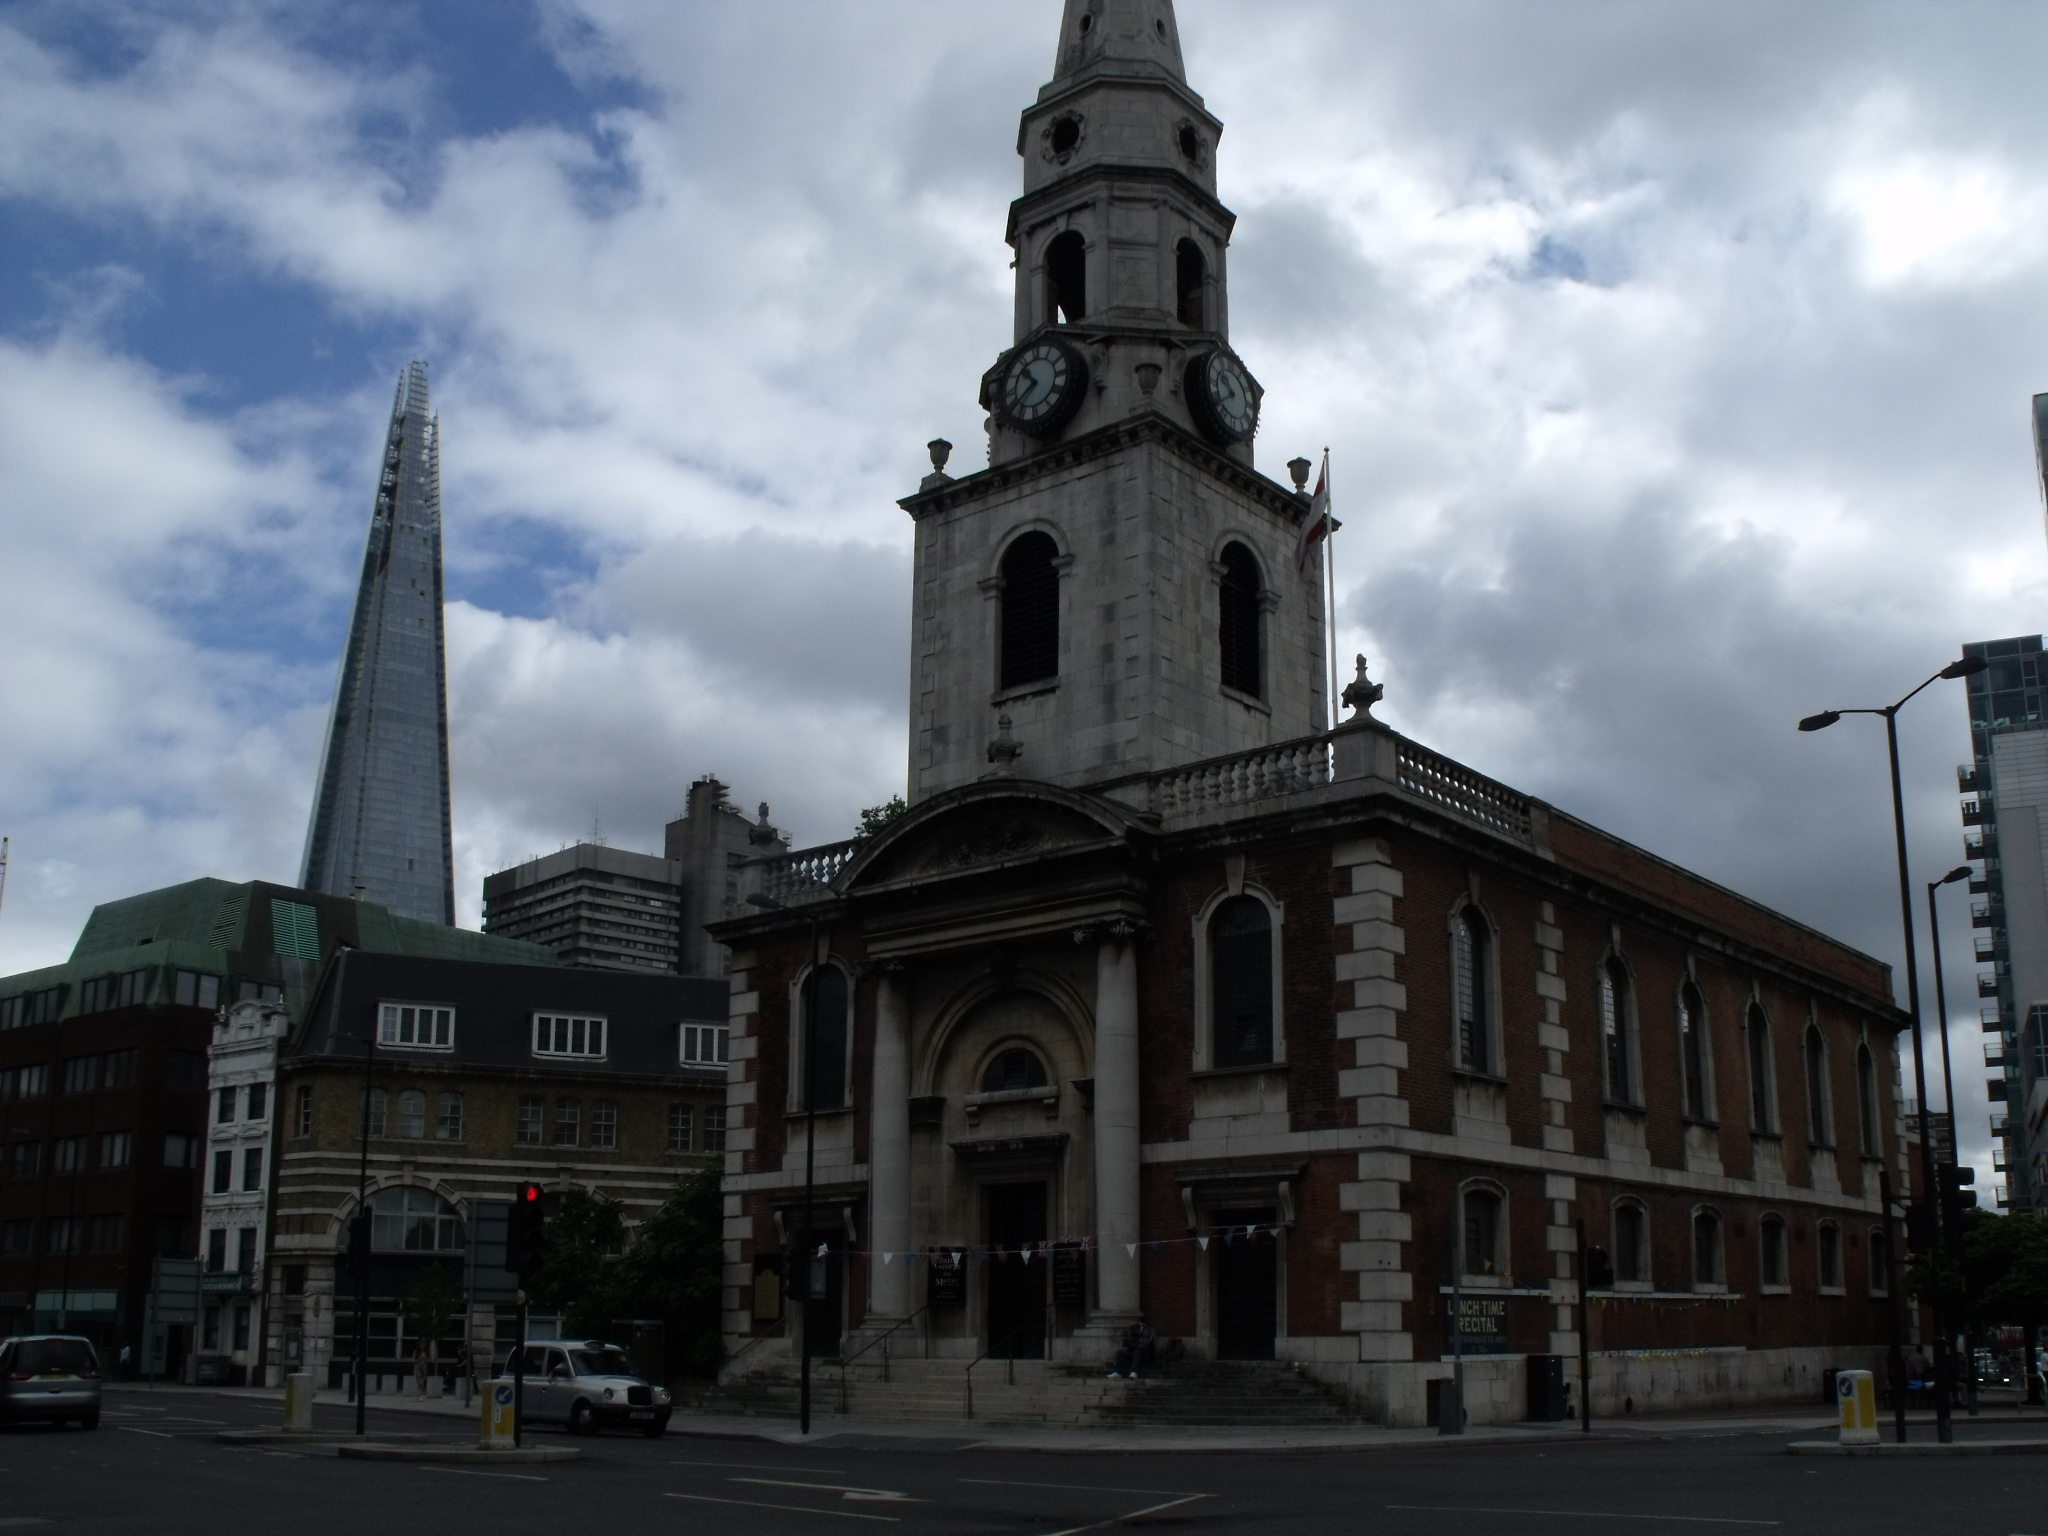 Uncategorized | churchtourismstudy